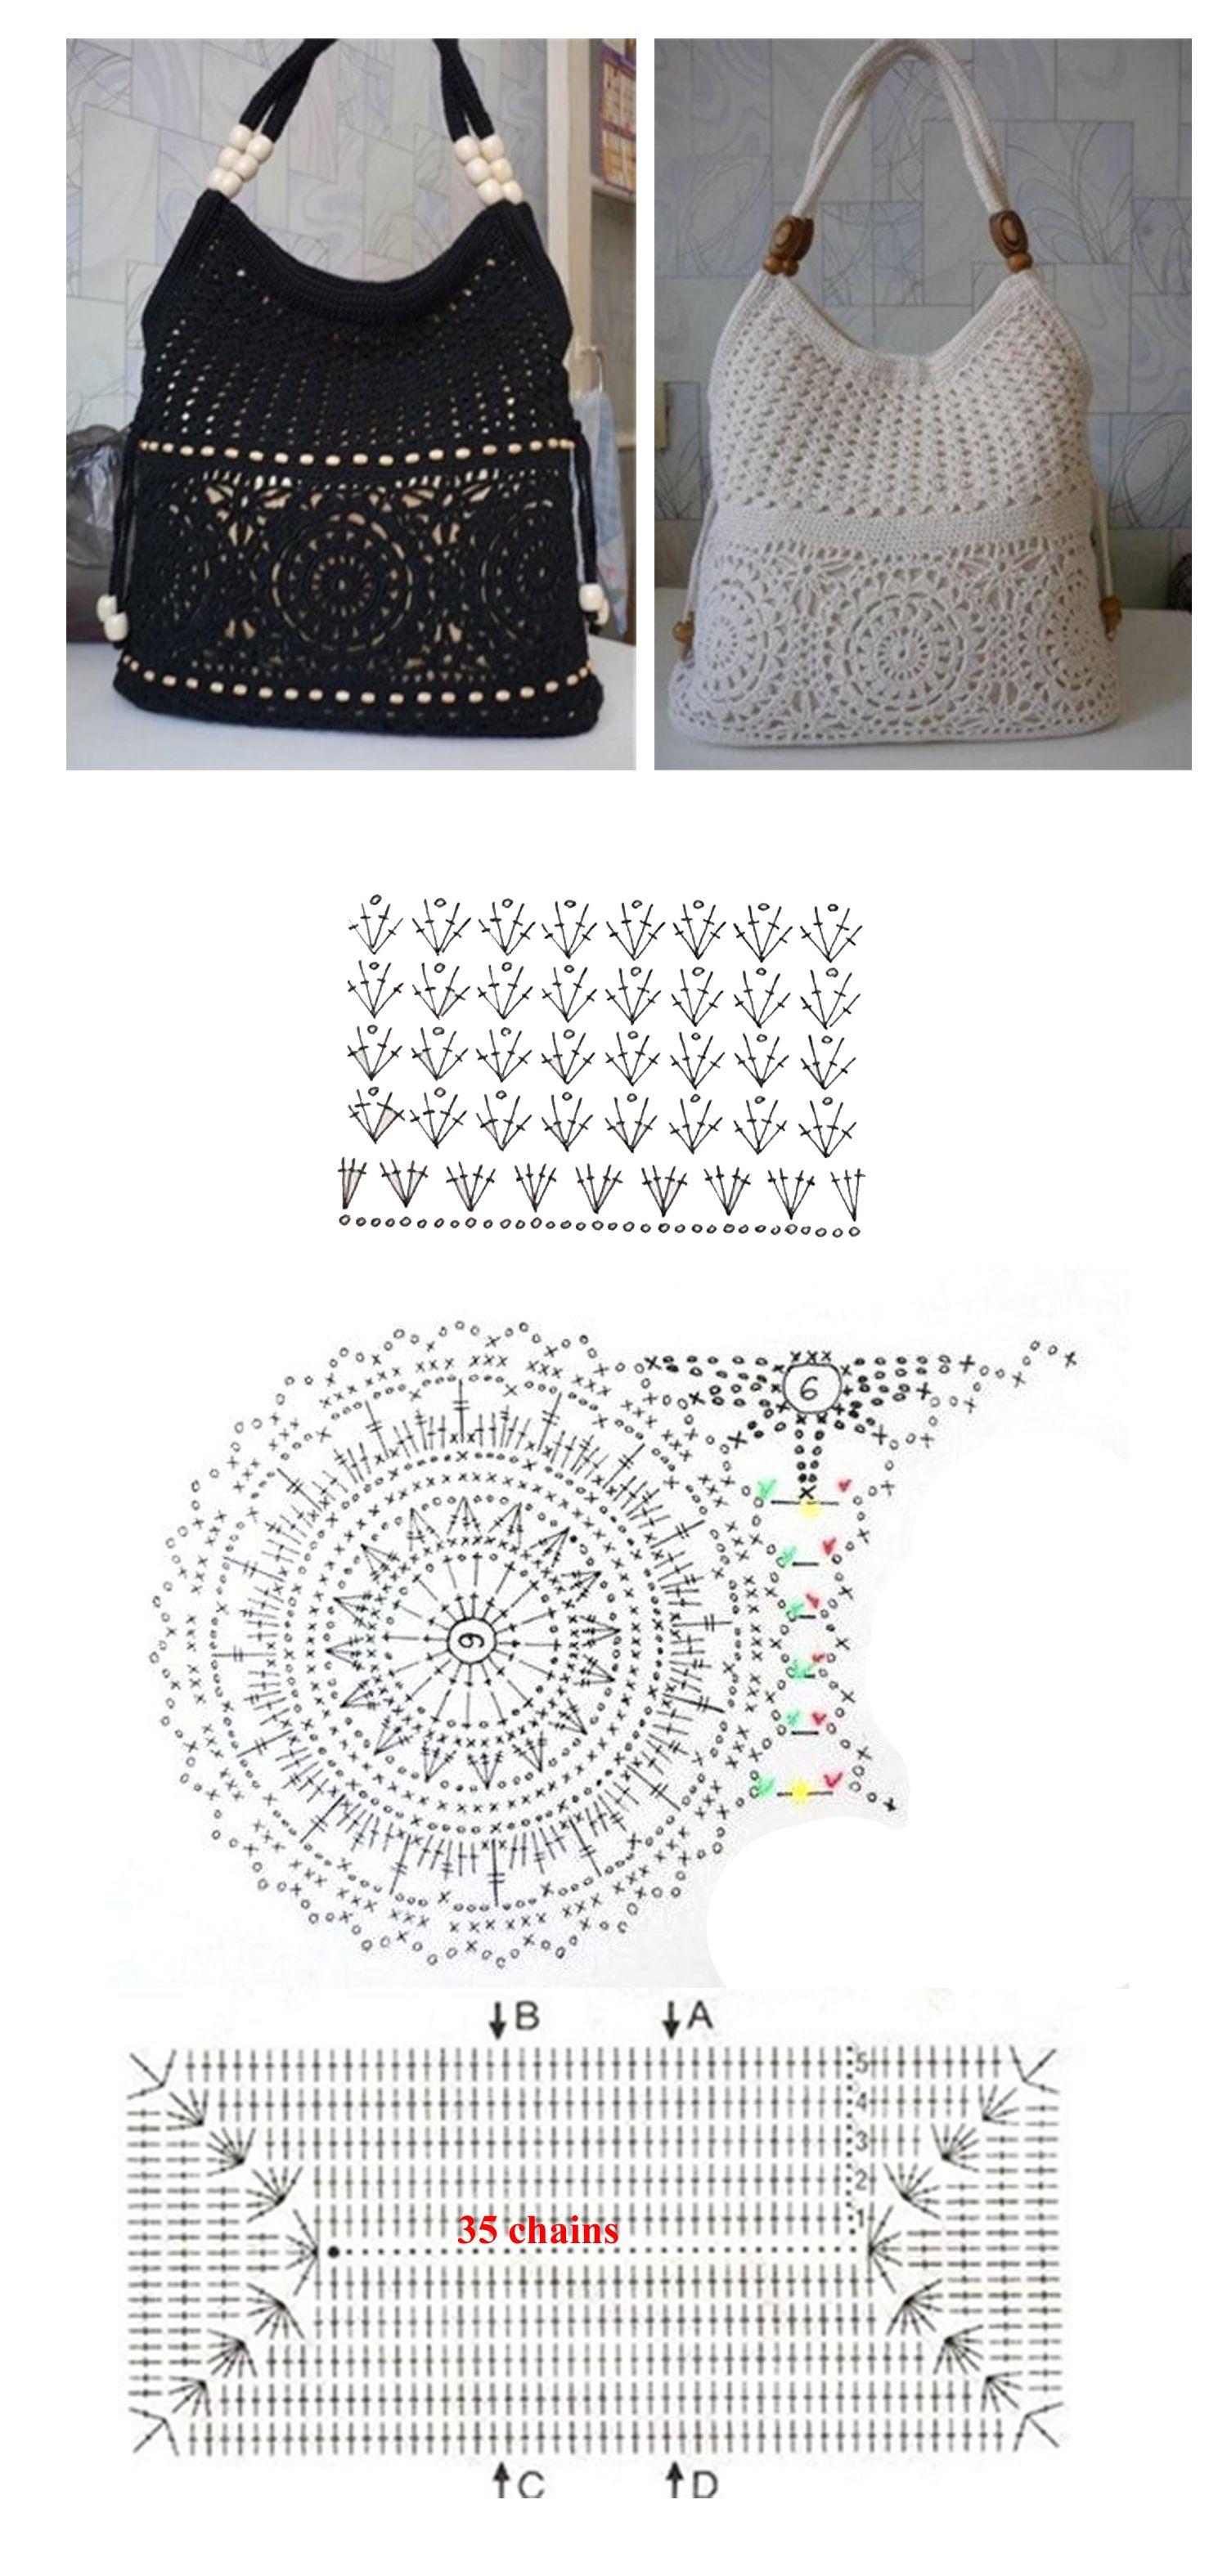 Pin by Alborz Choob on crochet | Pinterest | Croché, Ganchillo and ...